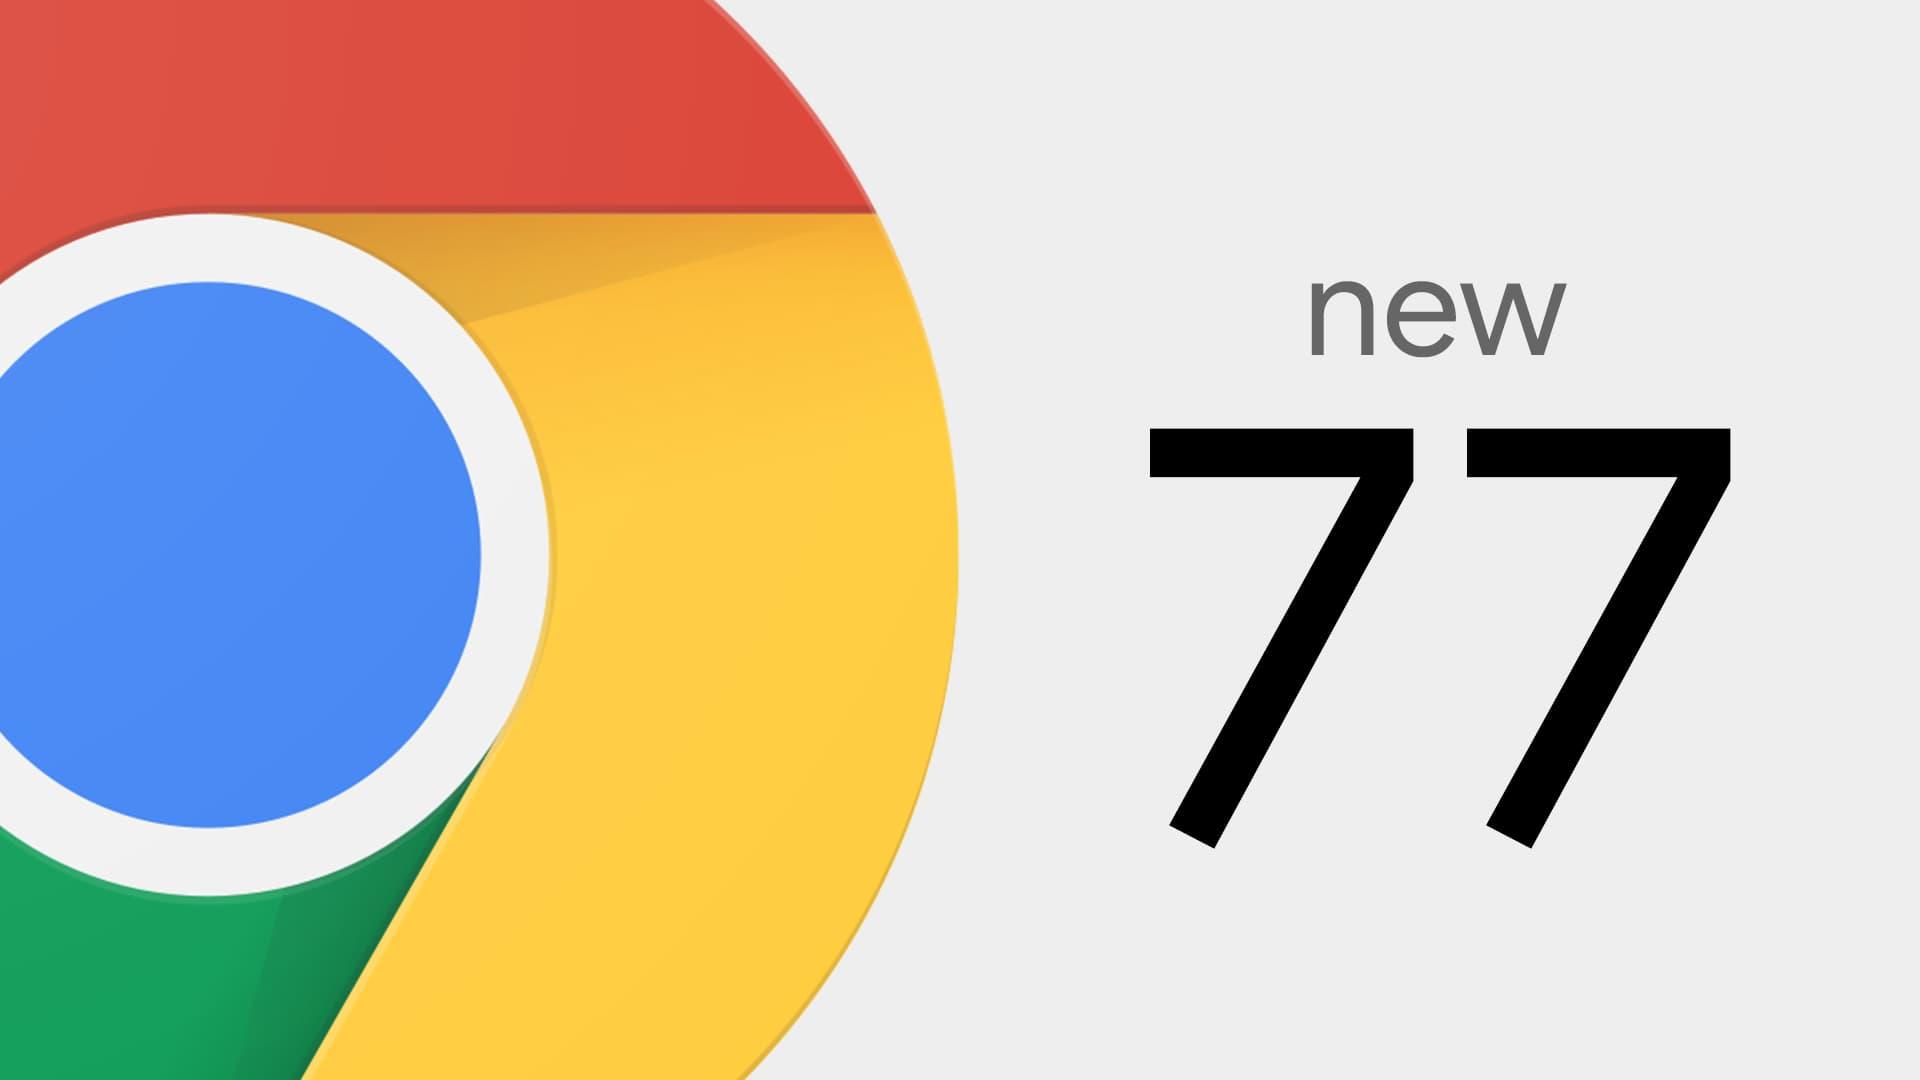 77 77